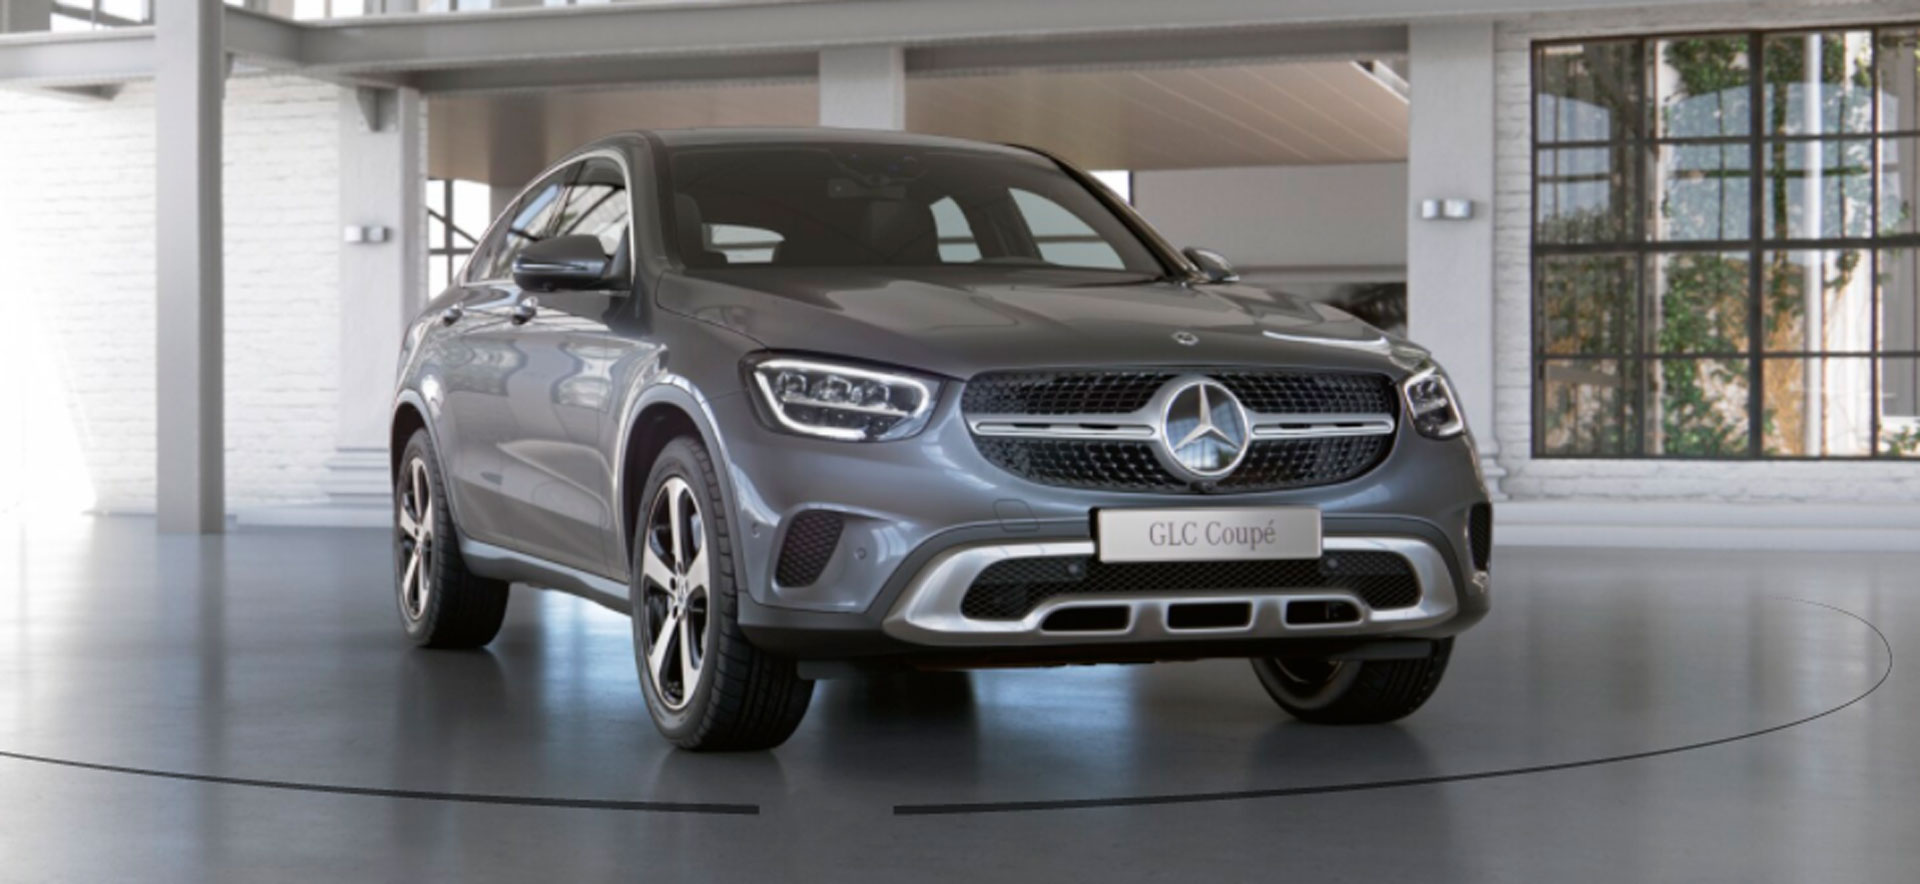 Mercedes-Benz GLC Coupe 52600370